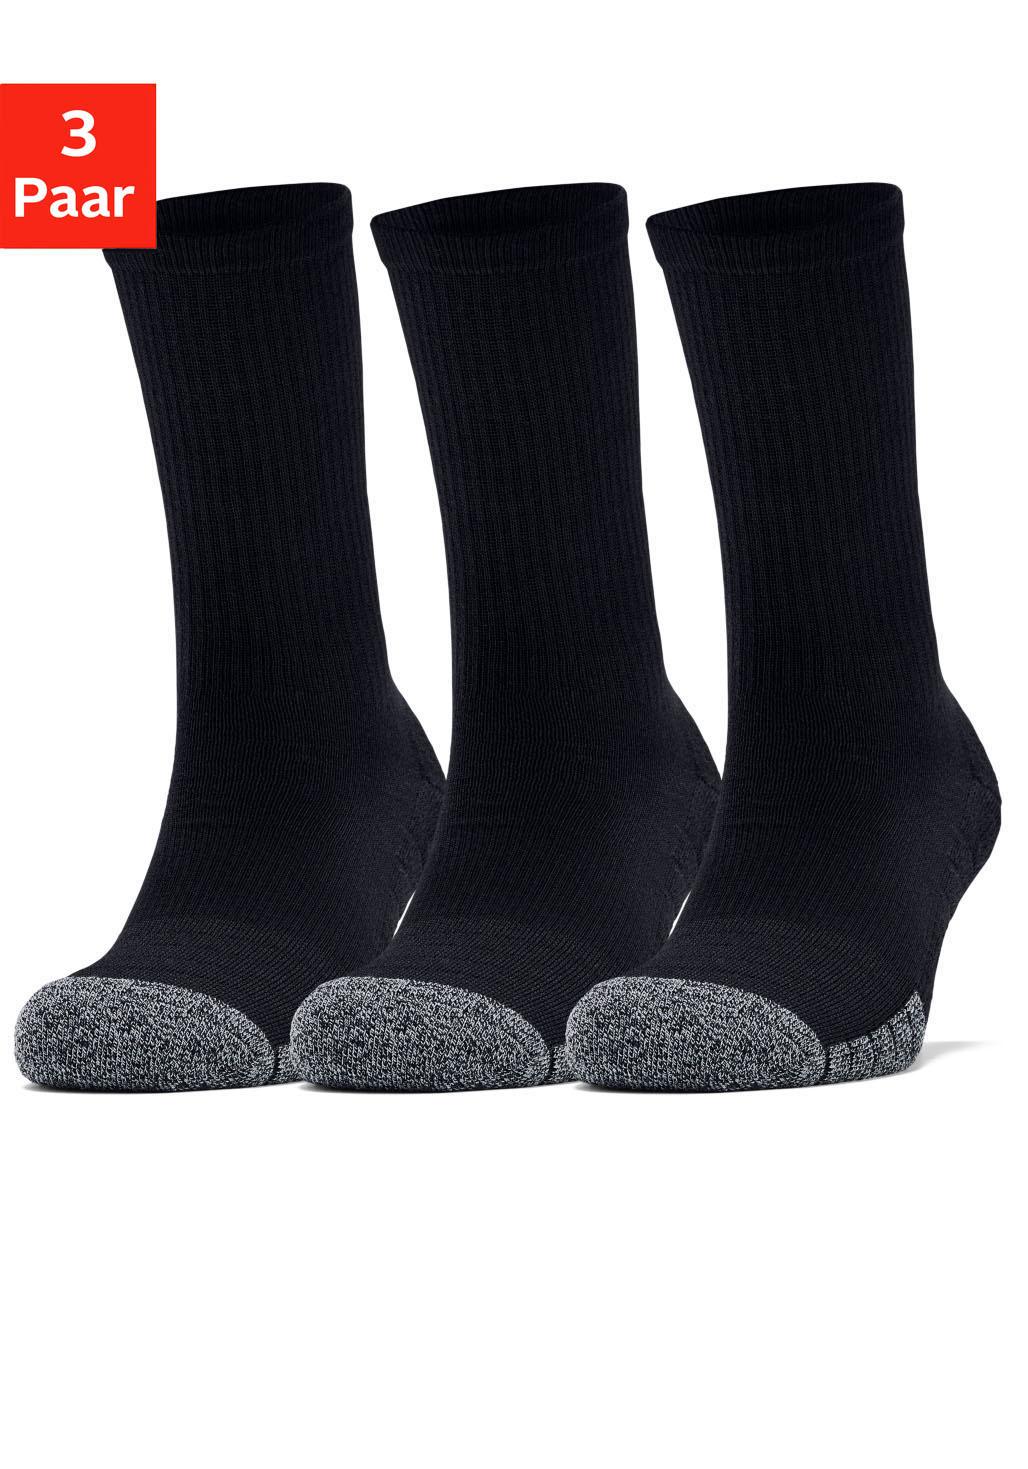 Under Armour® Socken (3 Paar)